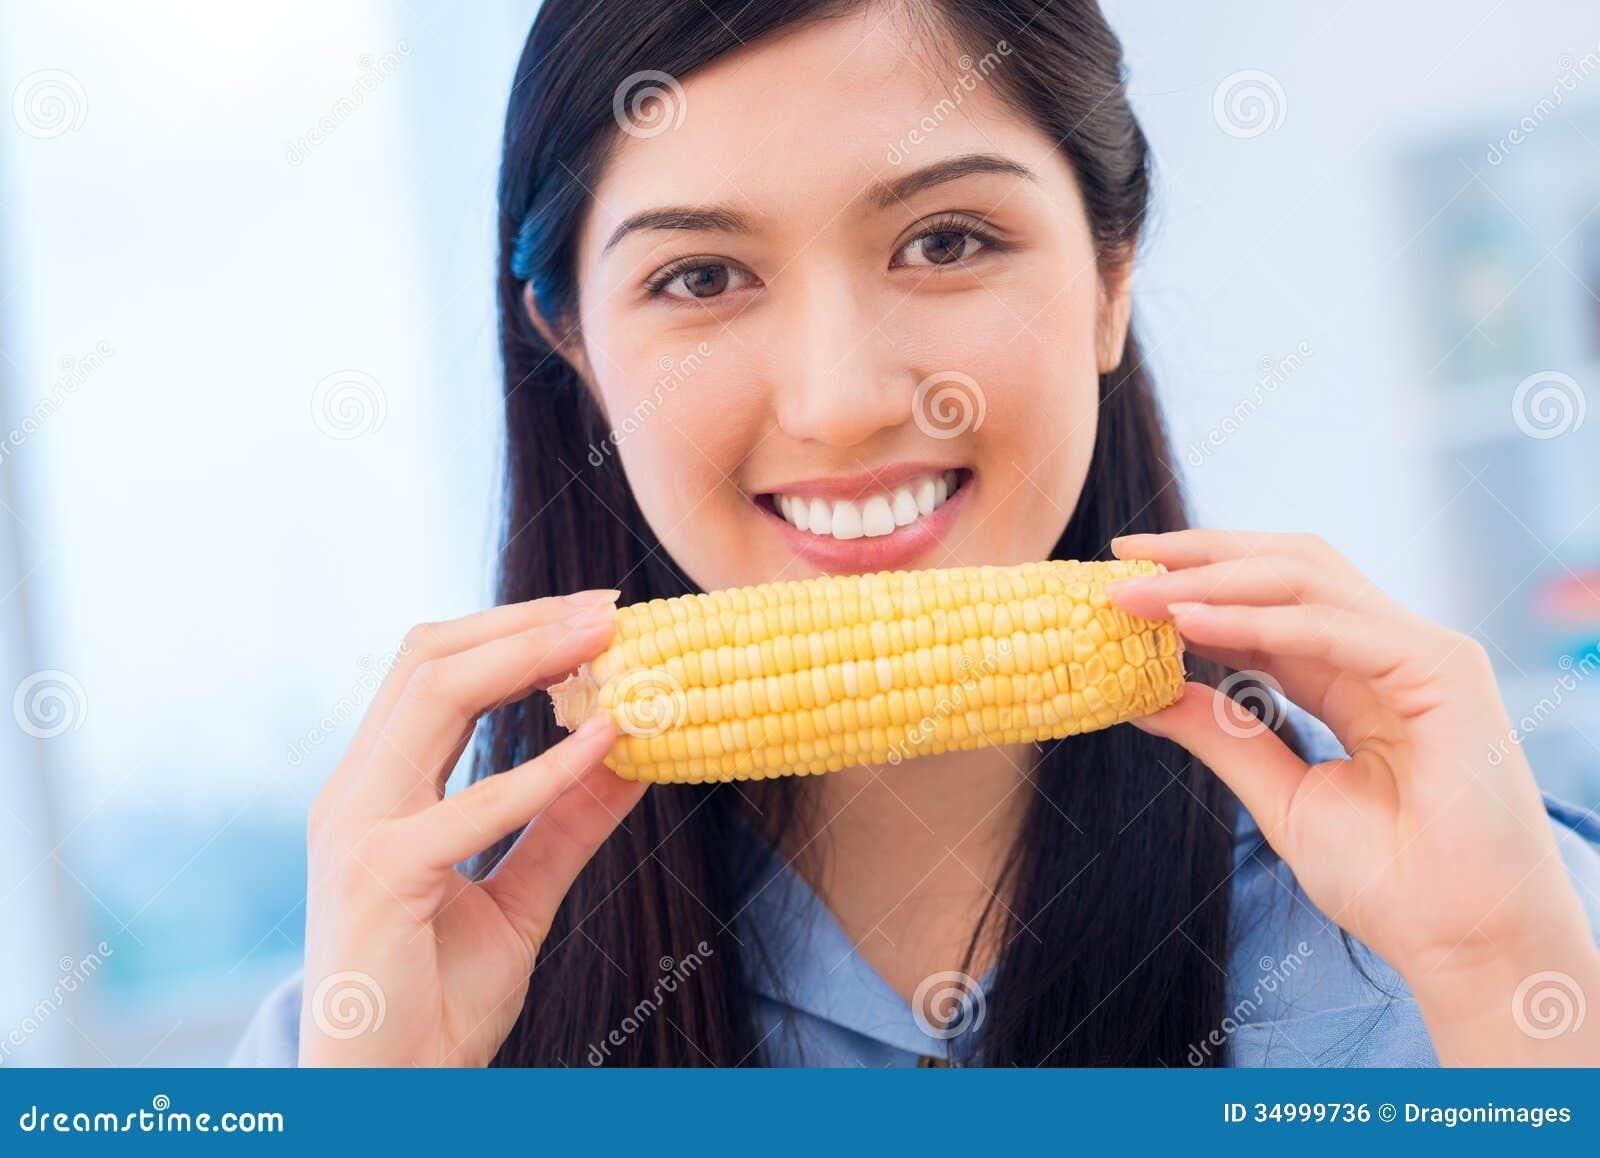 corn cob royalty free stock image   image 34999736